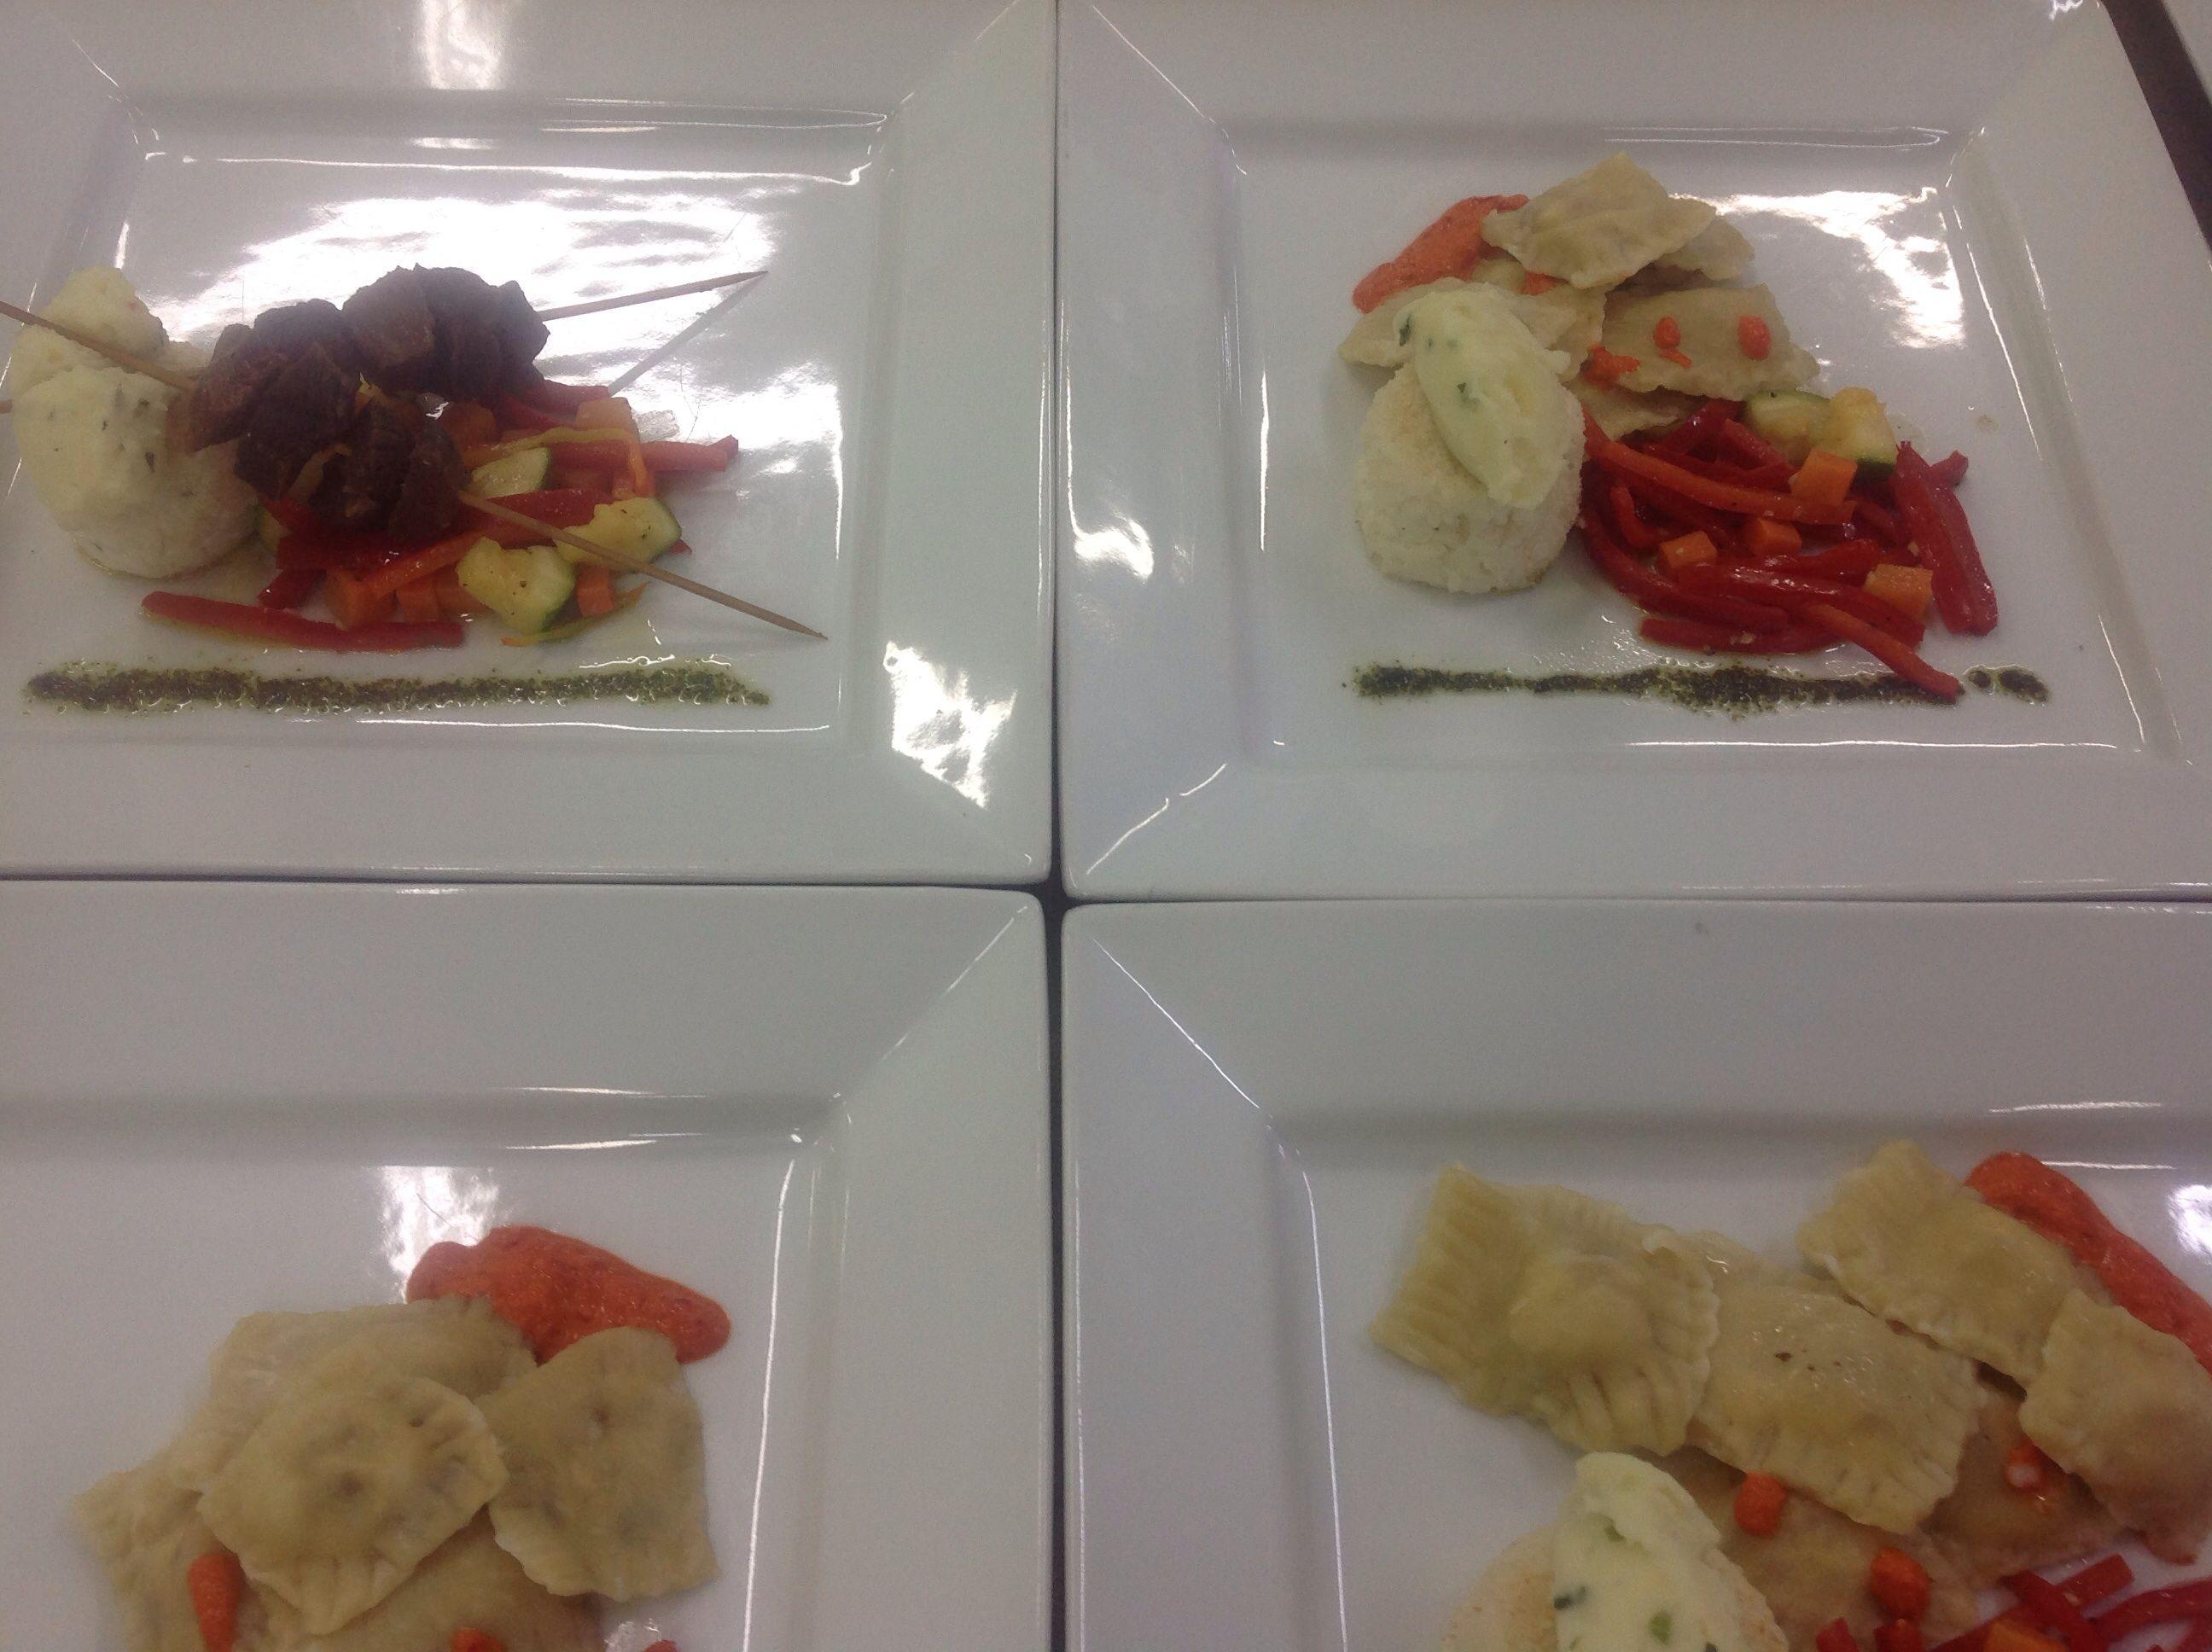 Ravioli with veg beef mash potatoes and rice cake.